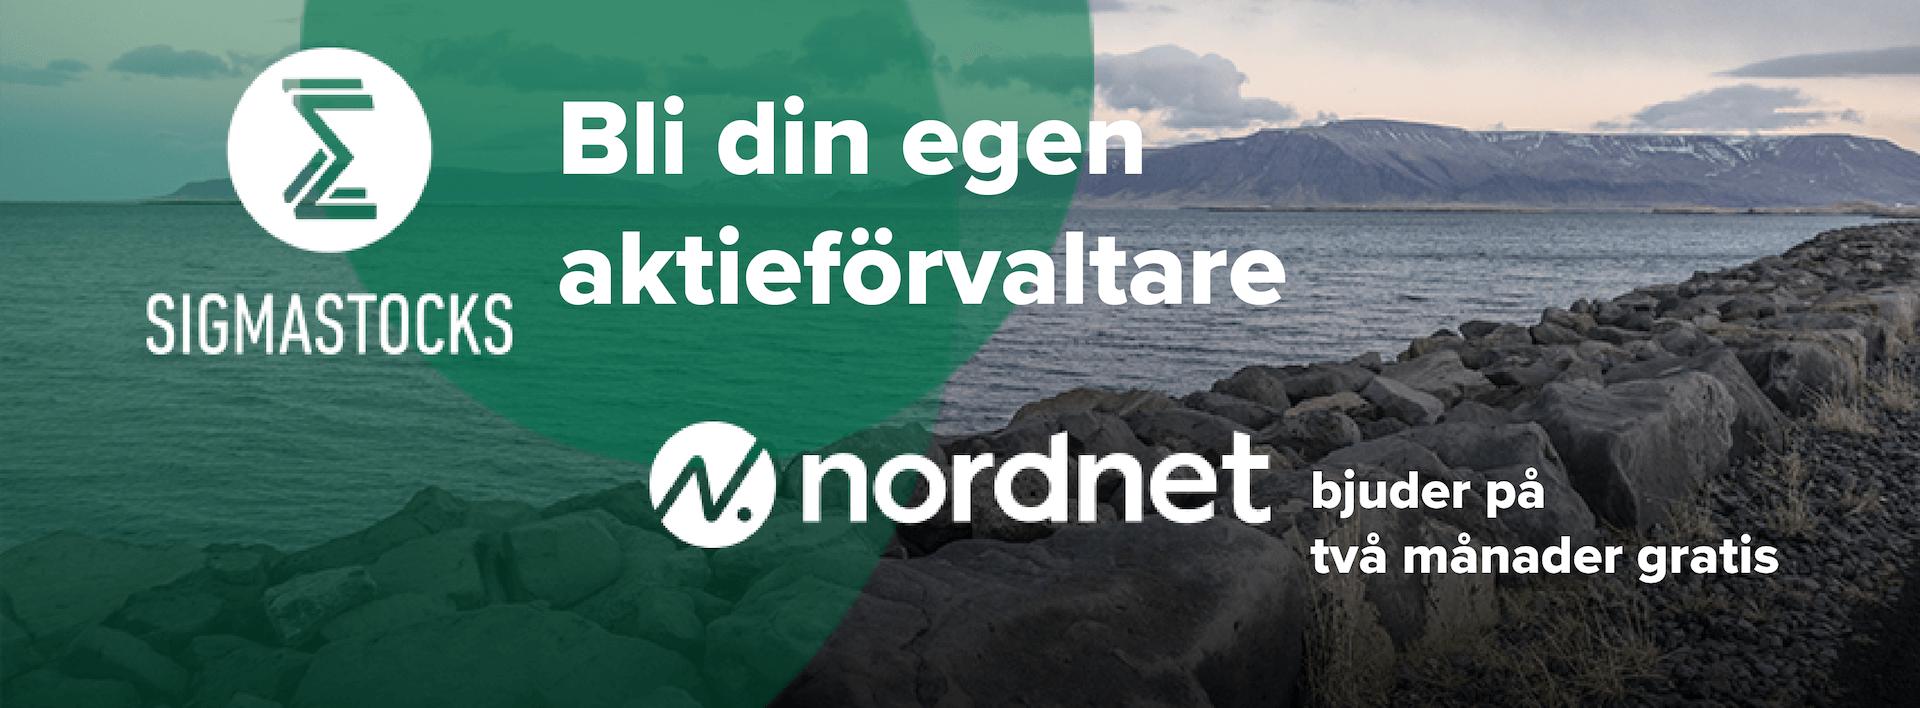 Nordnet banner 2man